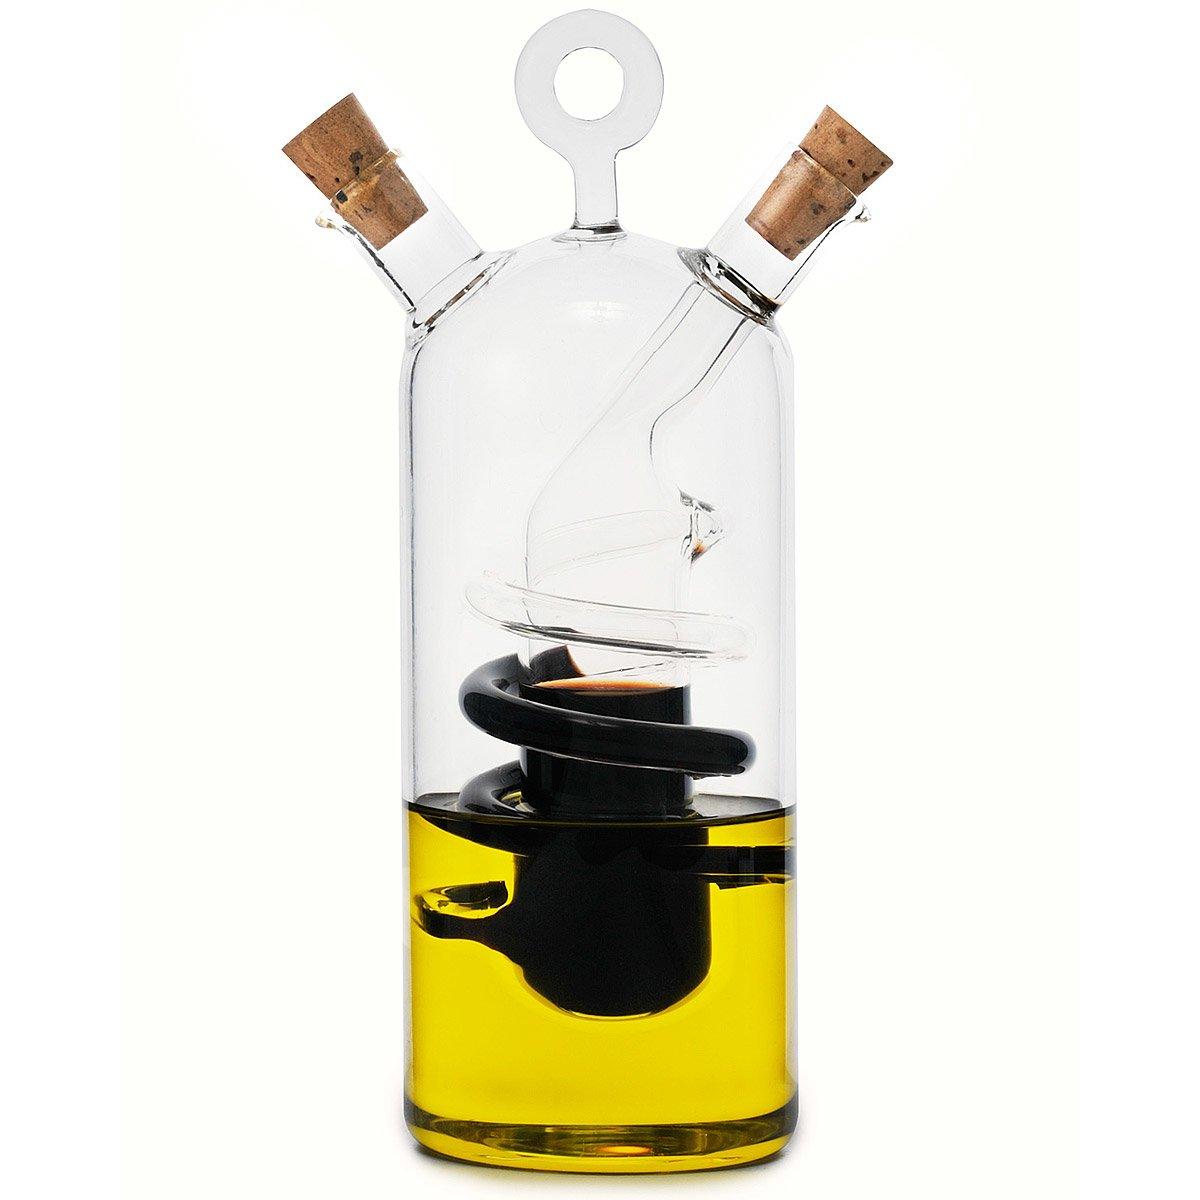 cruet modena  oil and vinegar dispenser tabletop seasonings  - cruet modena  thumbnail